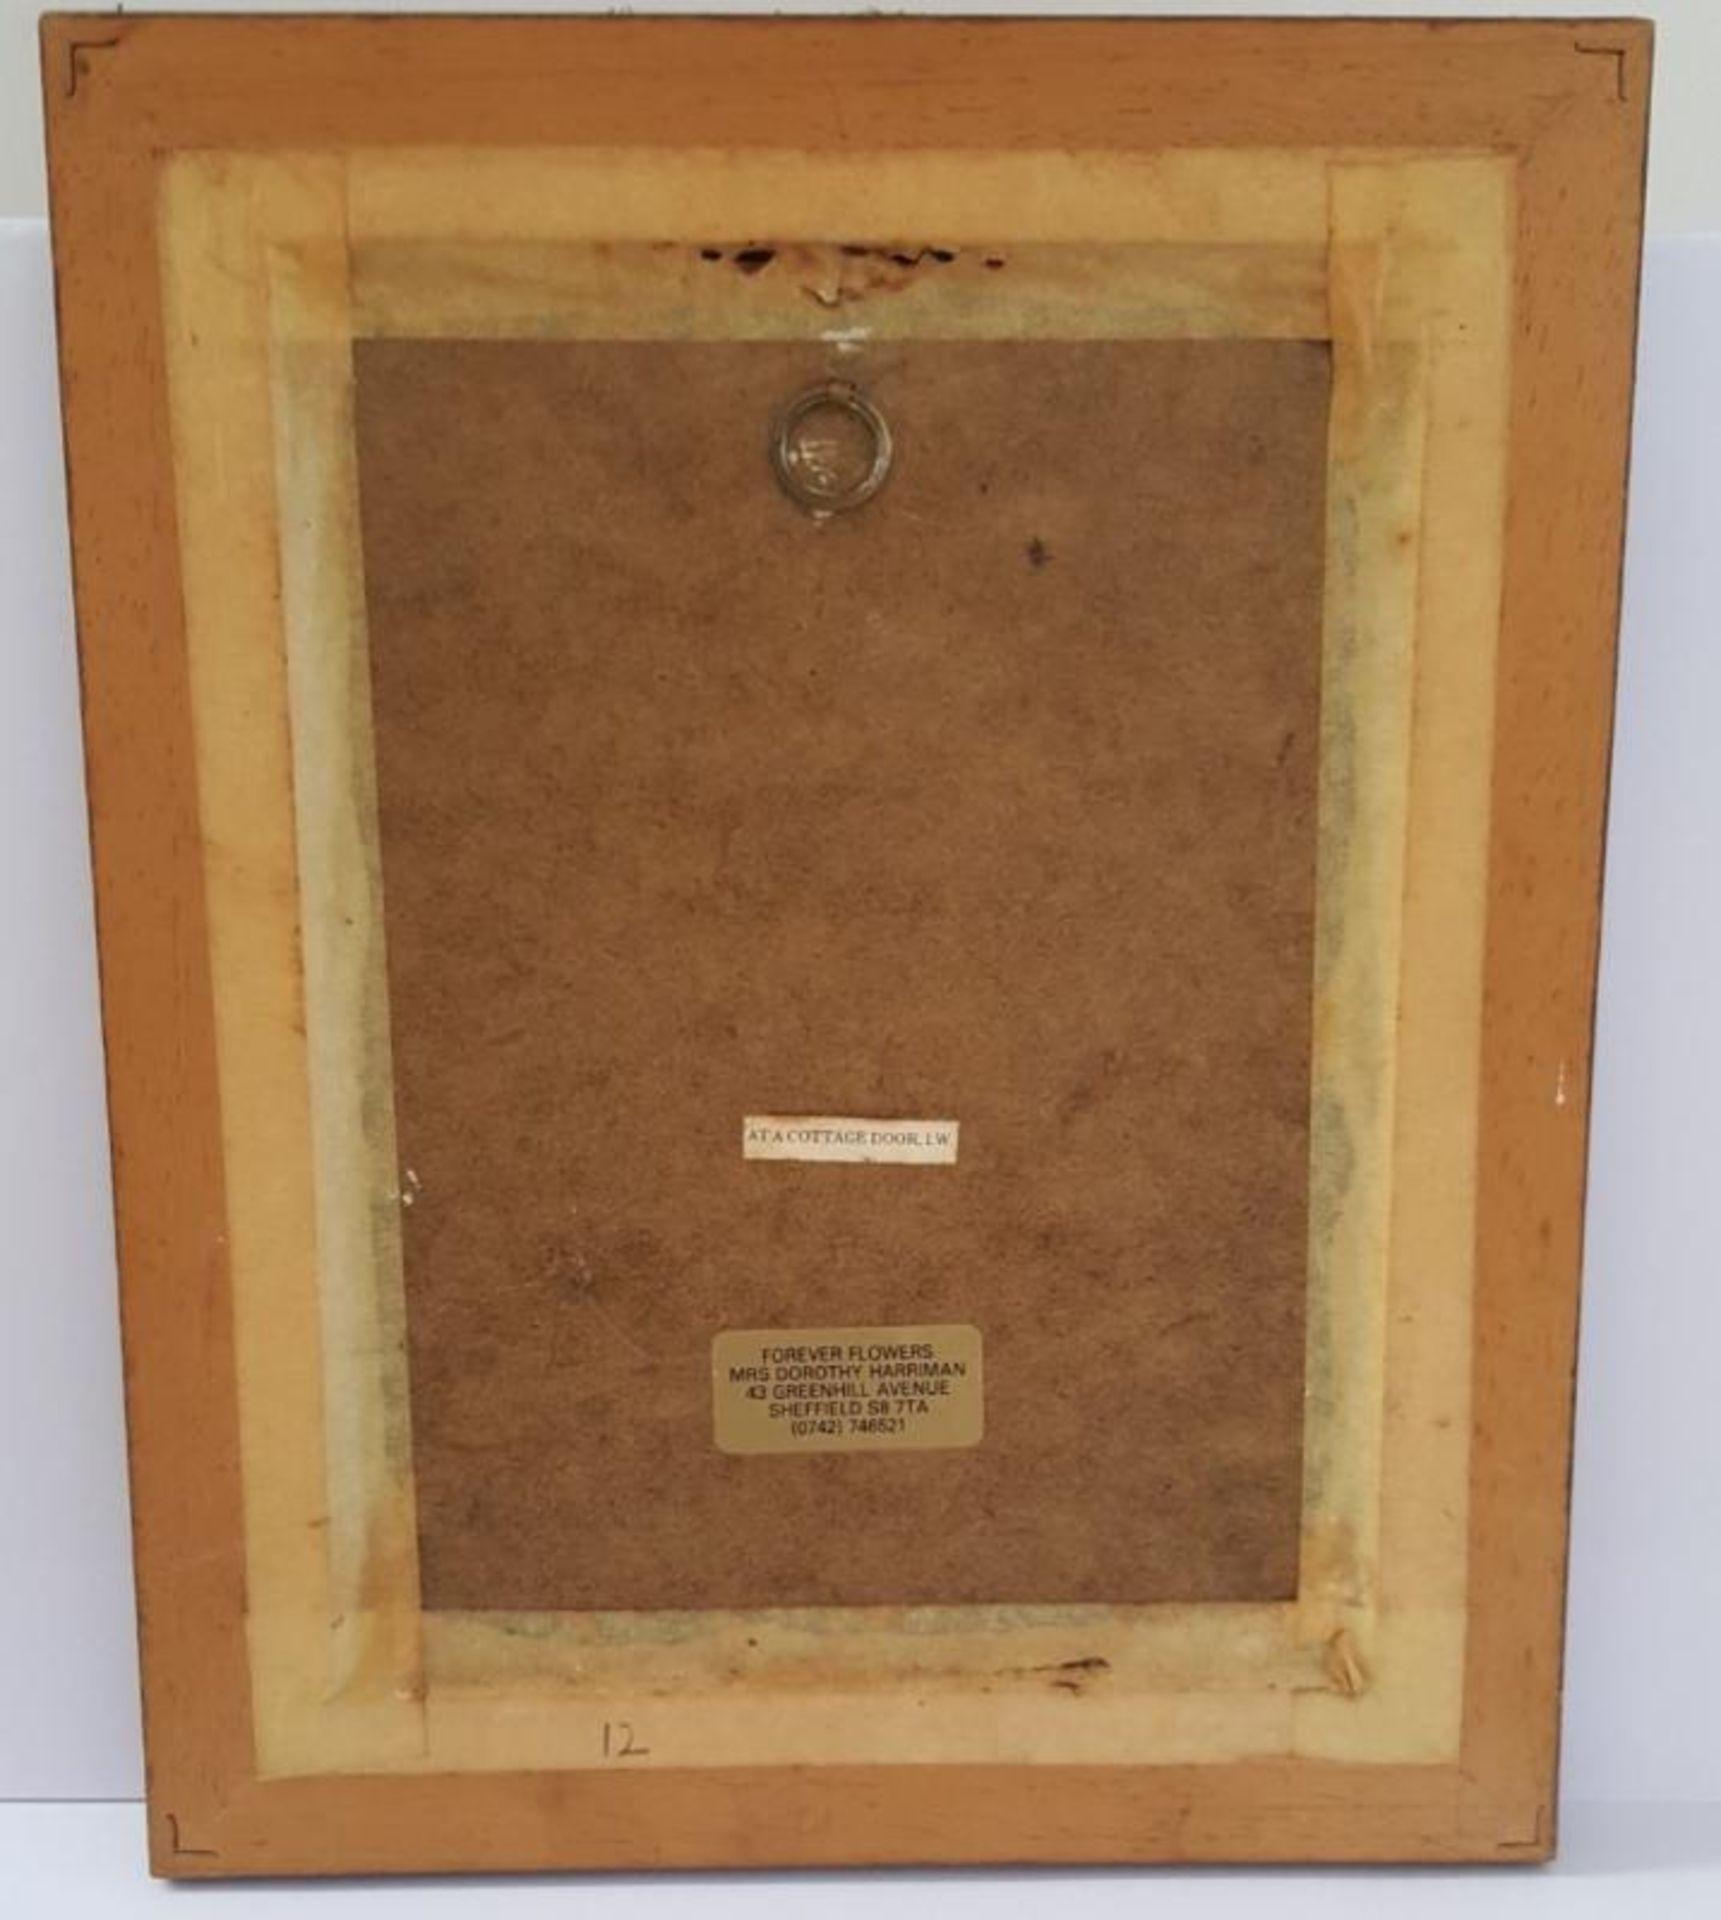 Lot 7388 - 1 x Framed Artwork Entitled 'At A Cottage Door' - Dimensions: H25/L20cm - Ref CQ340 E - CL334 - Loca